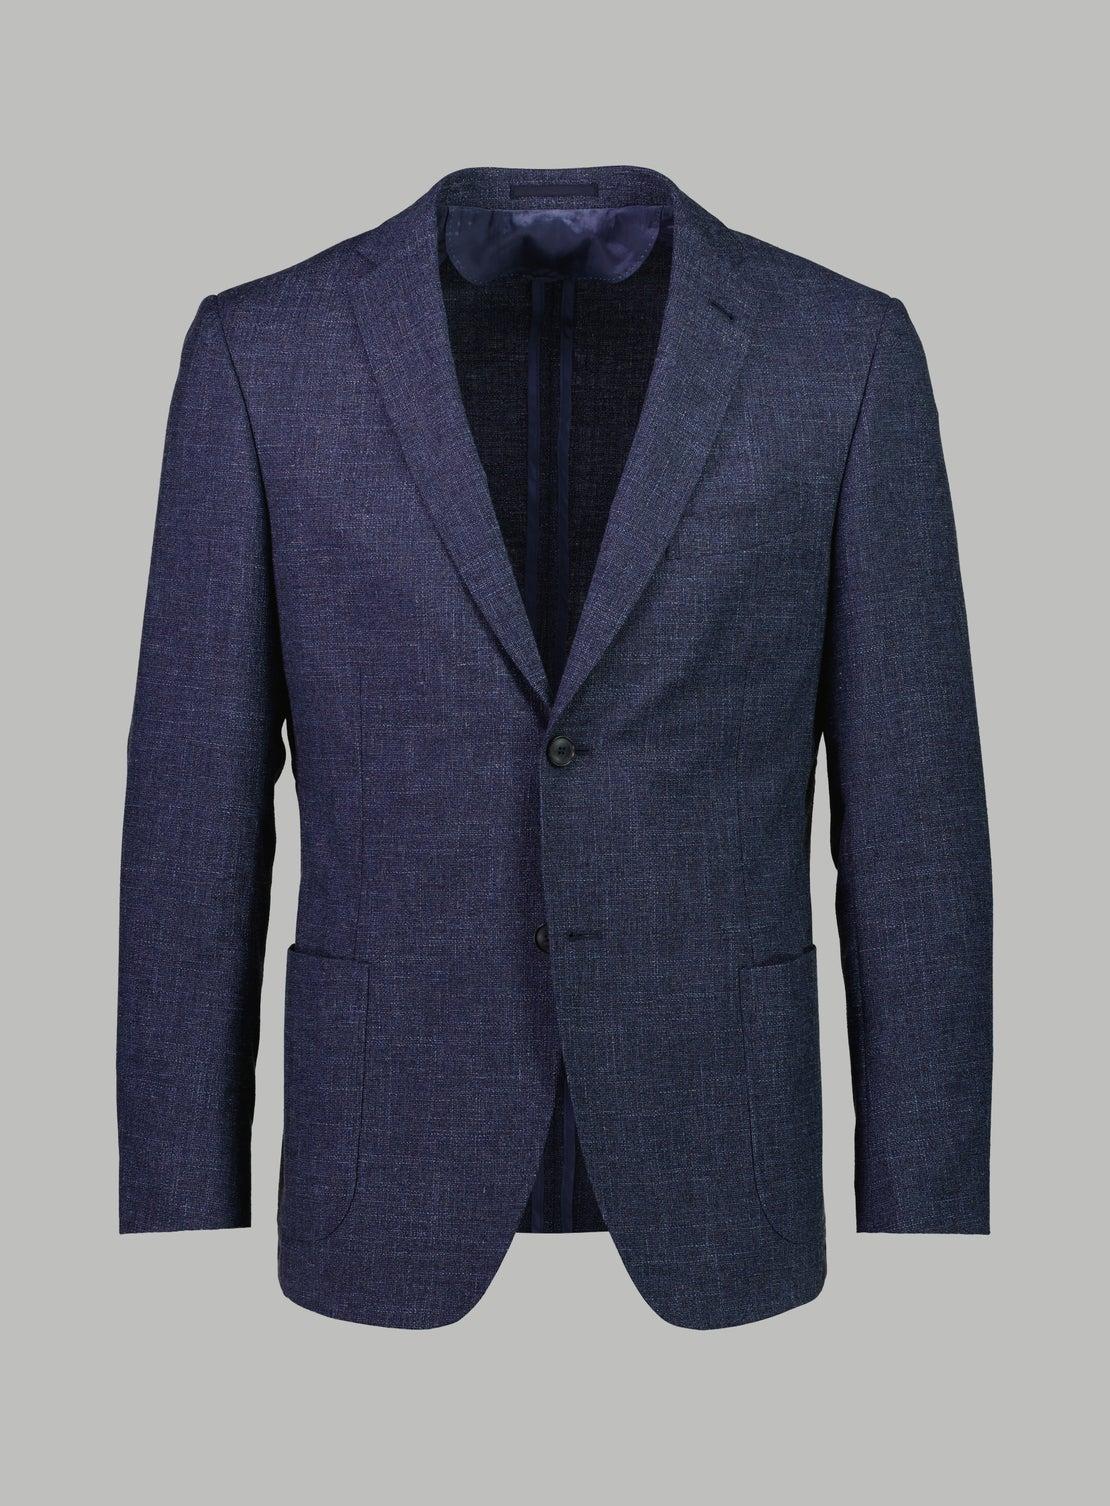 Lagos Denim Textured Jacket